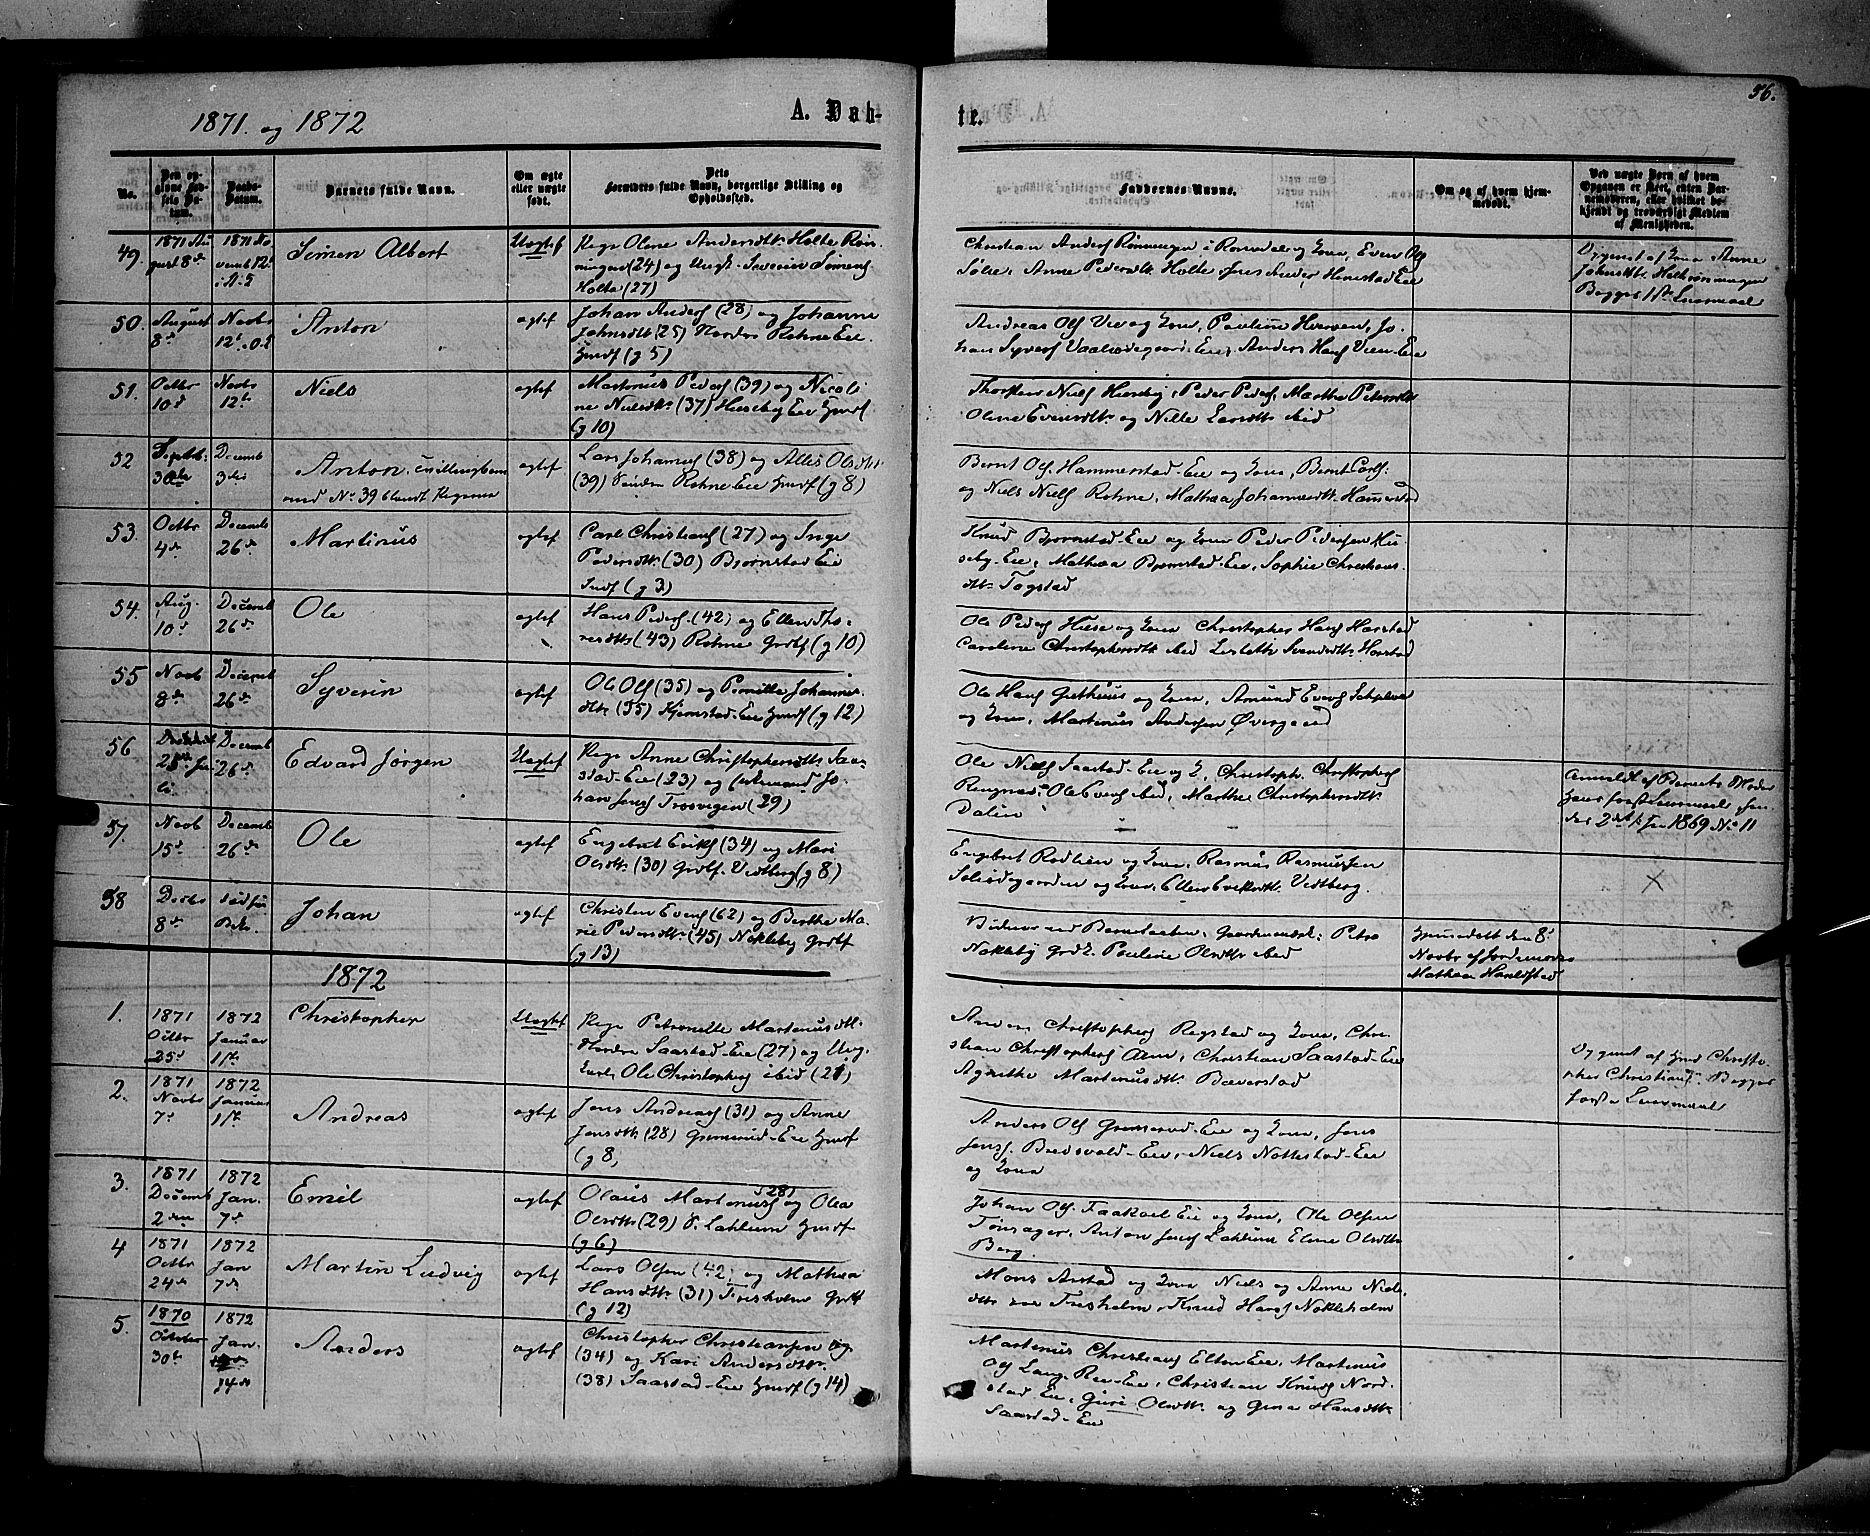 SAH, Stange prestekontor, K/L0013: Ministerialbok nr. 13, 1862-1879, s. 56